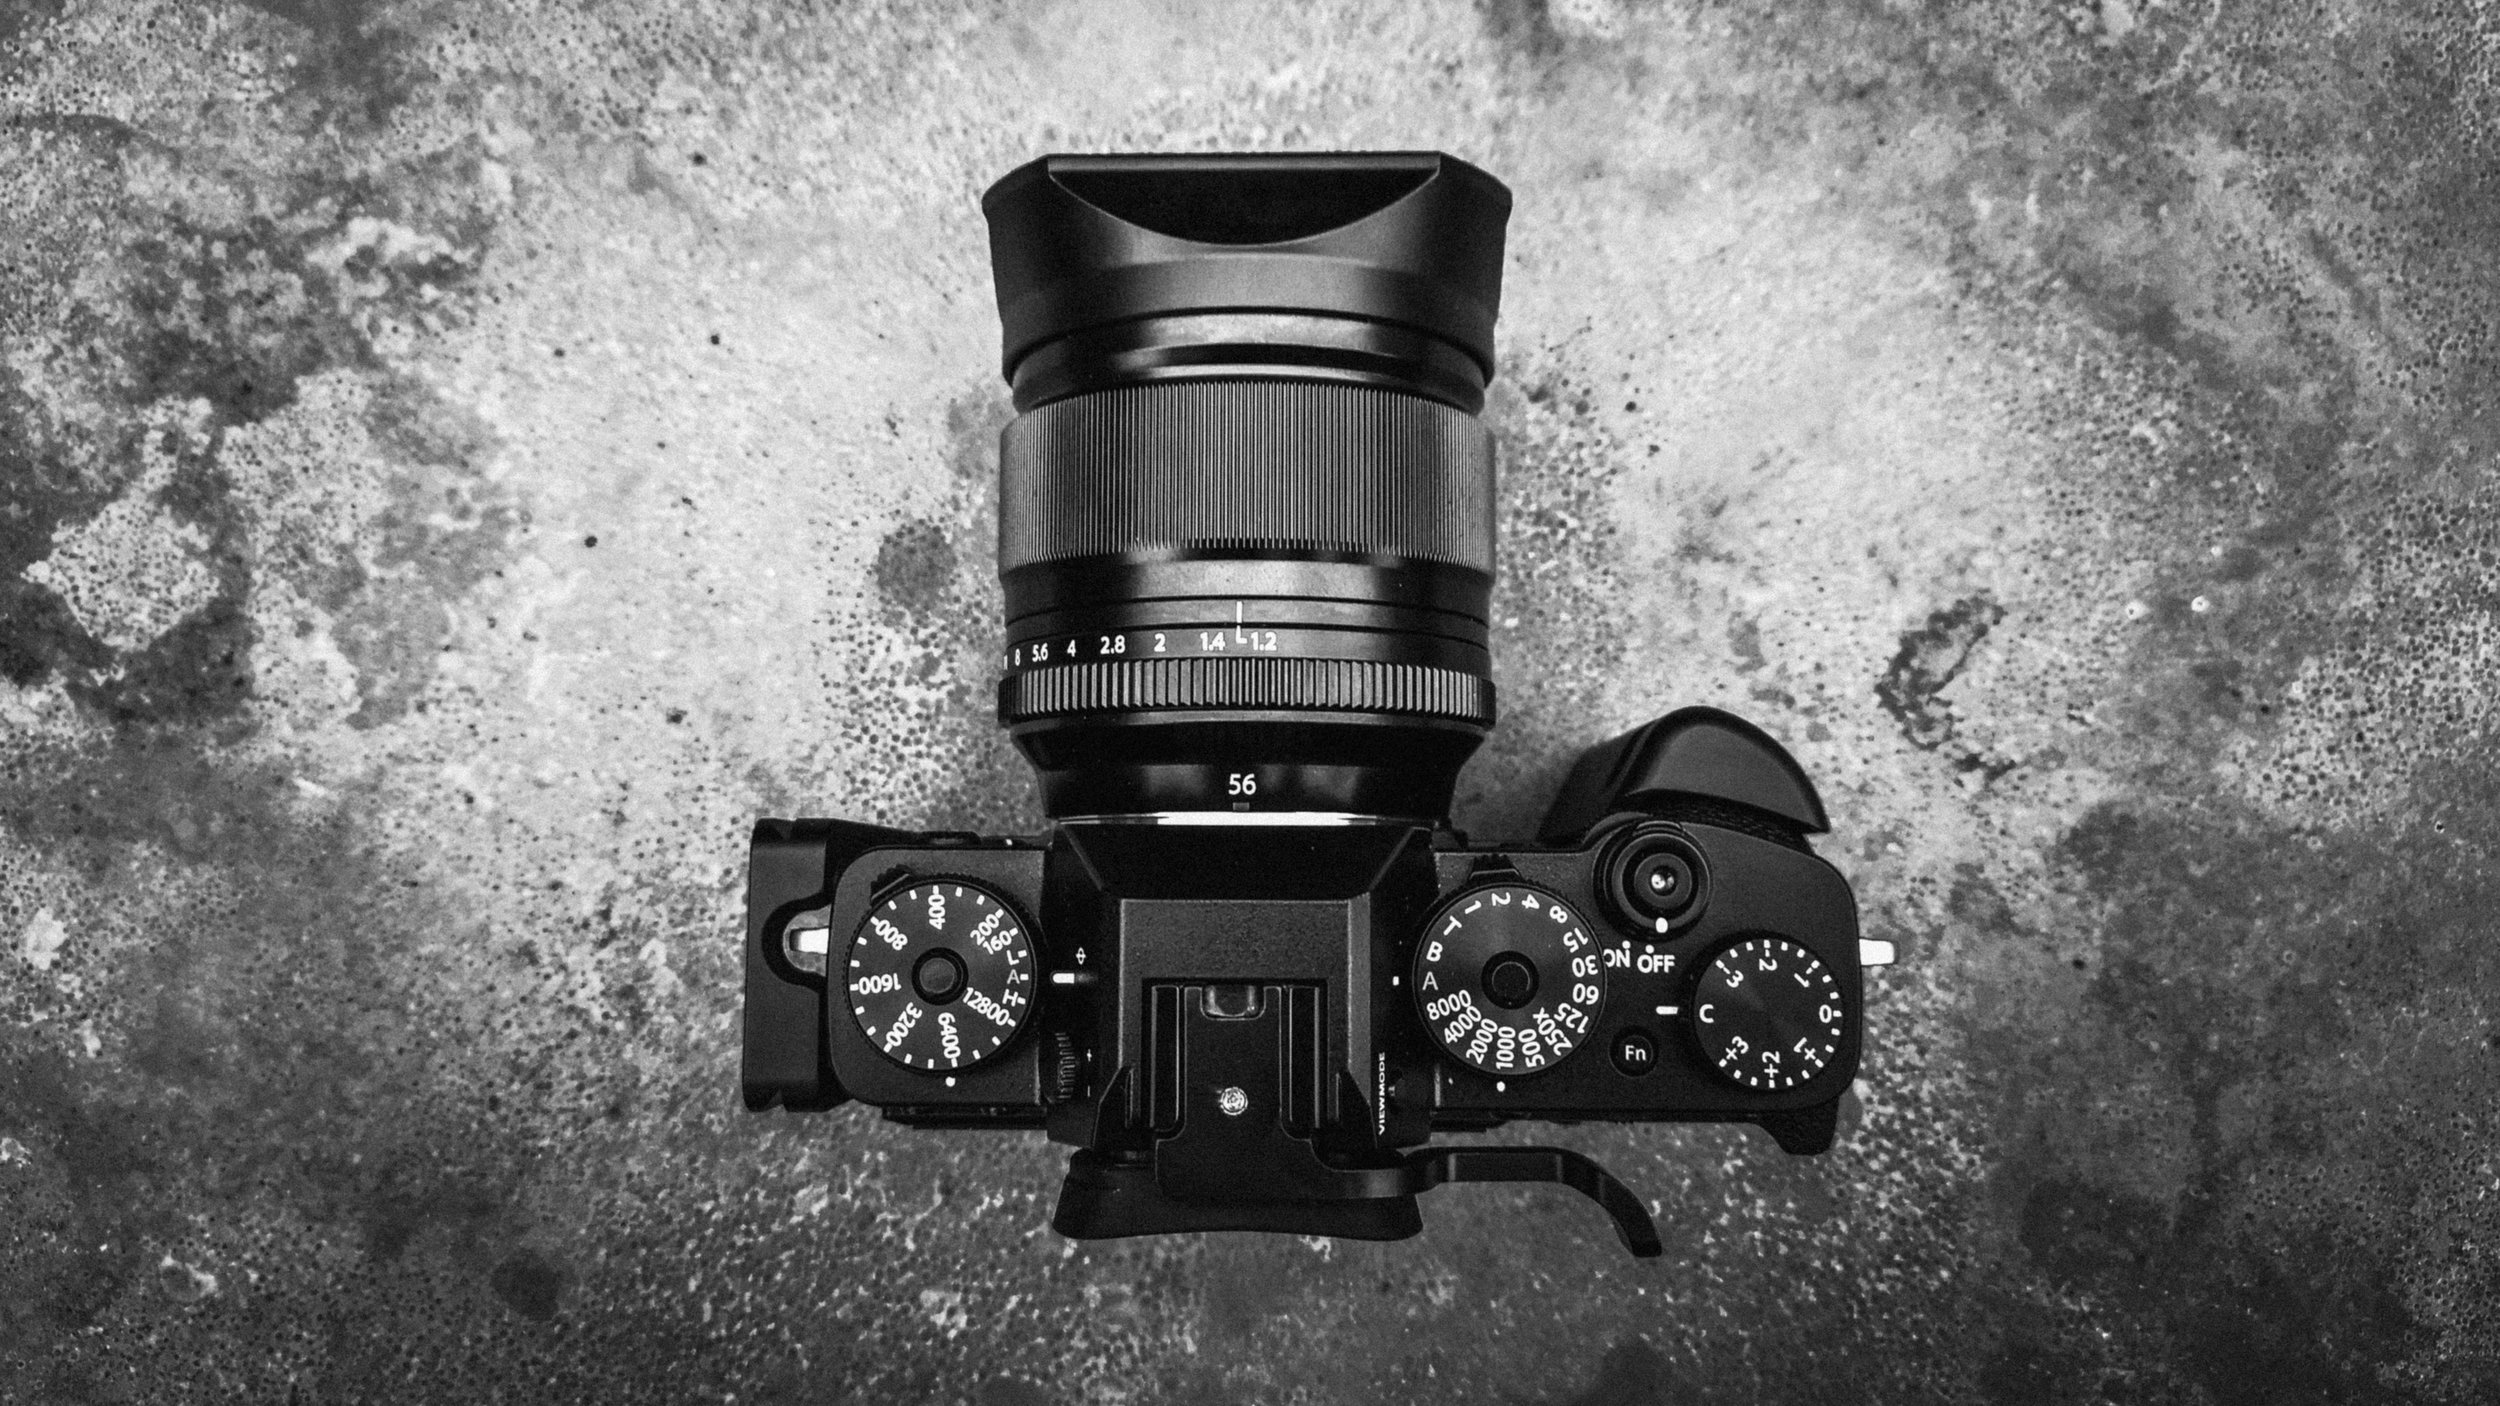 Fujifilm X-T3 handgrip thumbgrip 56mm 1.2